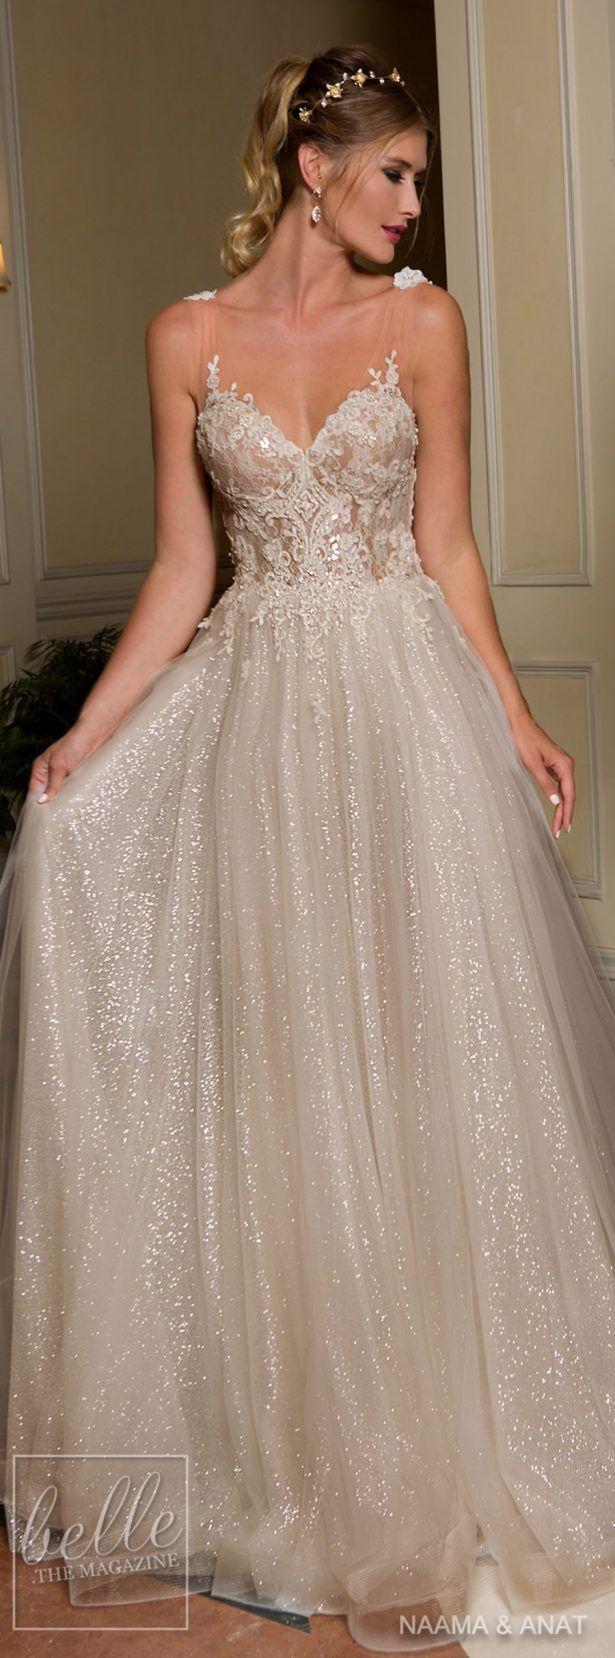 "Naama & Anat 2018 Wedding Dresses - ""Starlight"" Bridal Collection www.pinterest.com/laurenweds/wedding-dresses?utm_content=buffer366ee&utm_medium=social&utm_source=pinterest.com&utm_campaign=buffer"